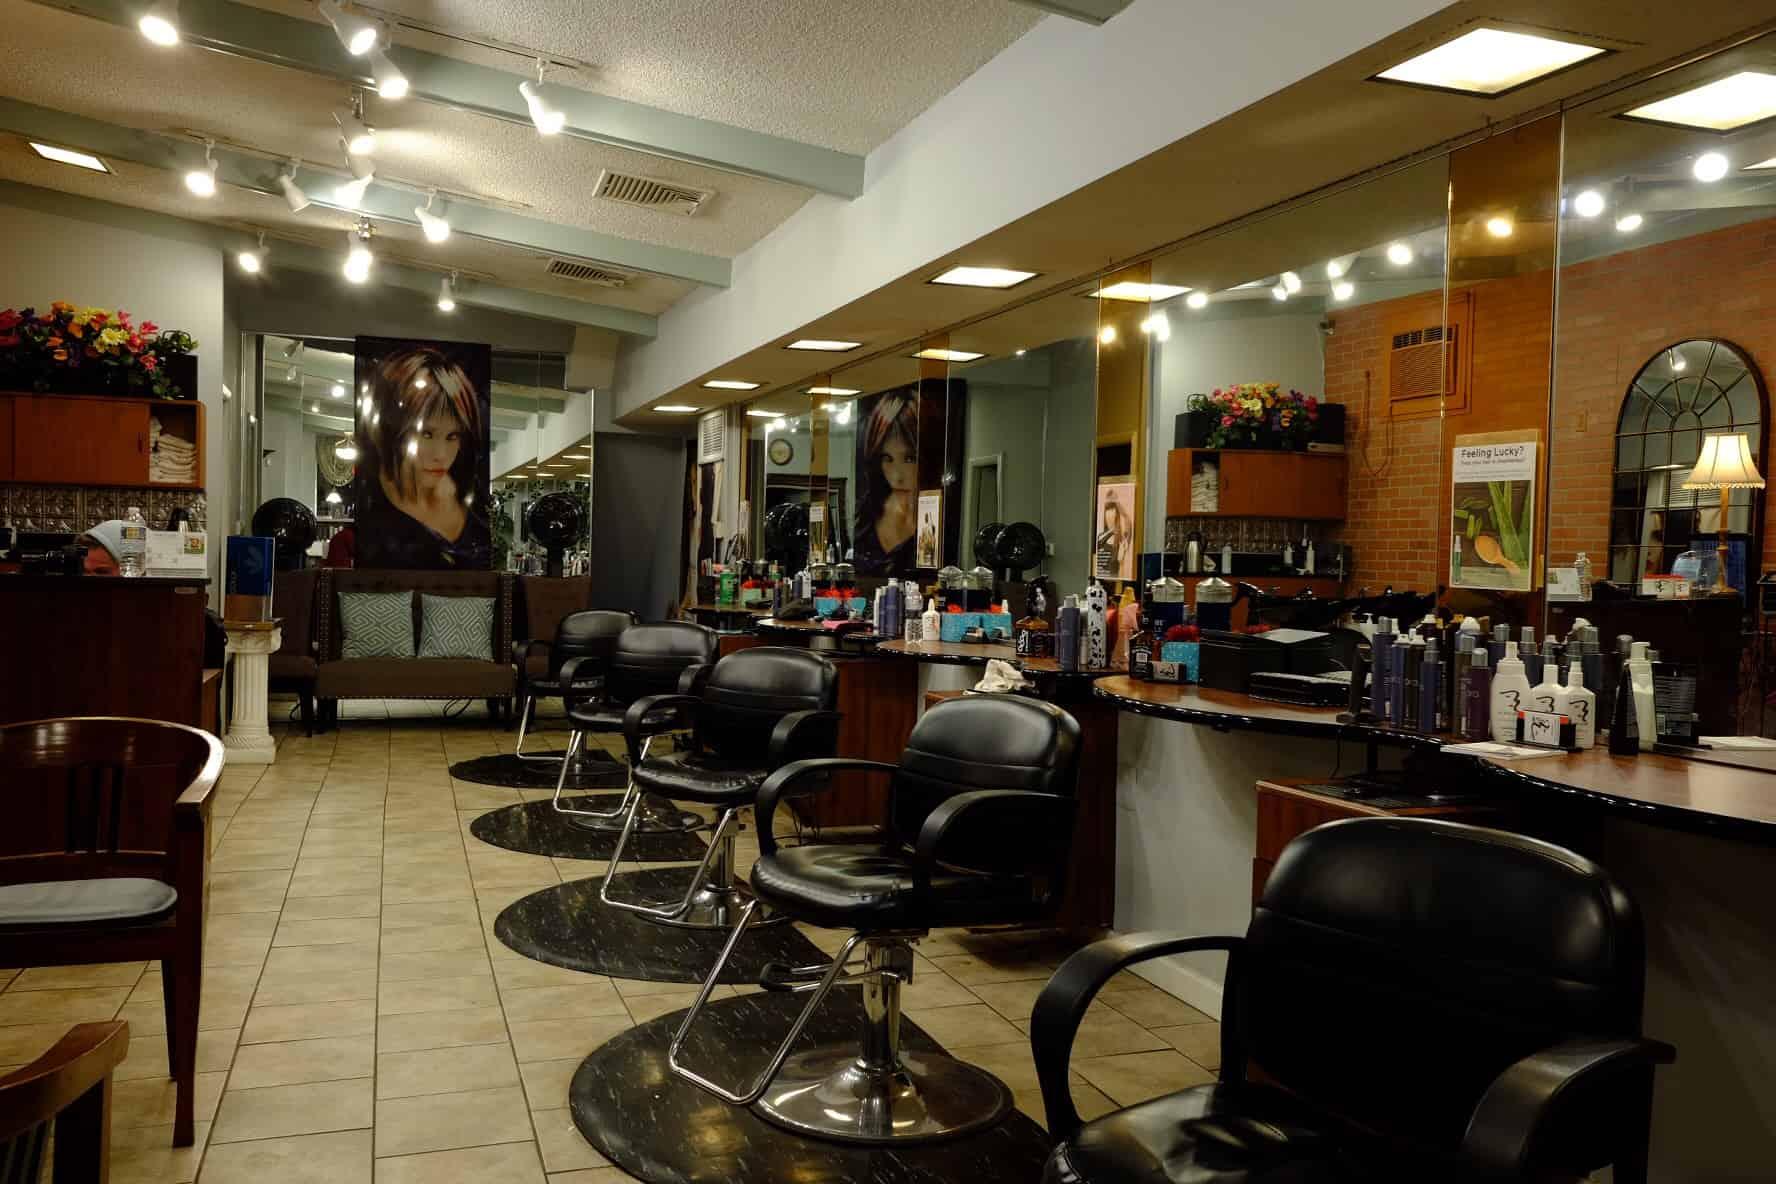 interior of hair salon in south philadelphia pa